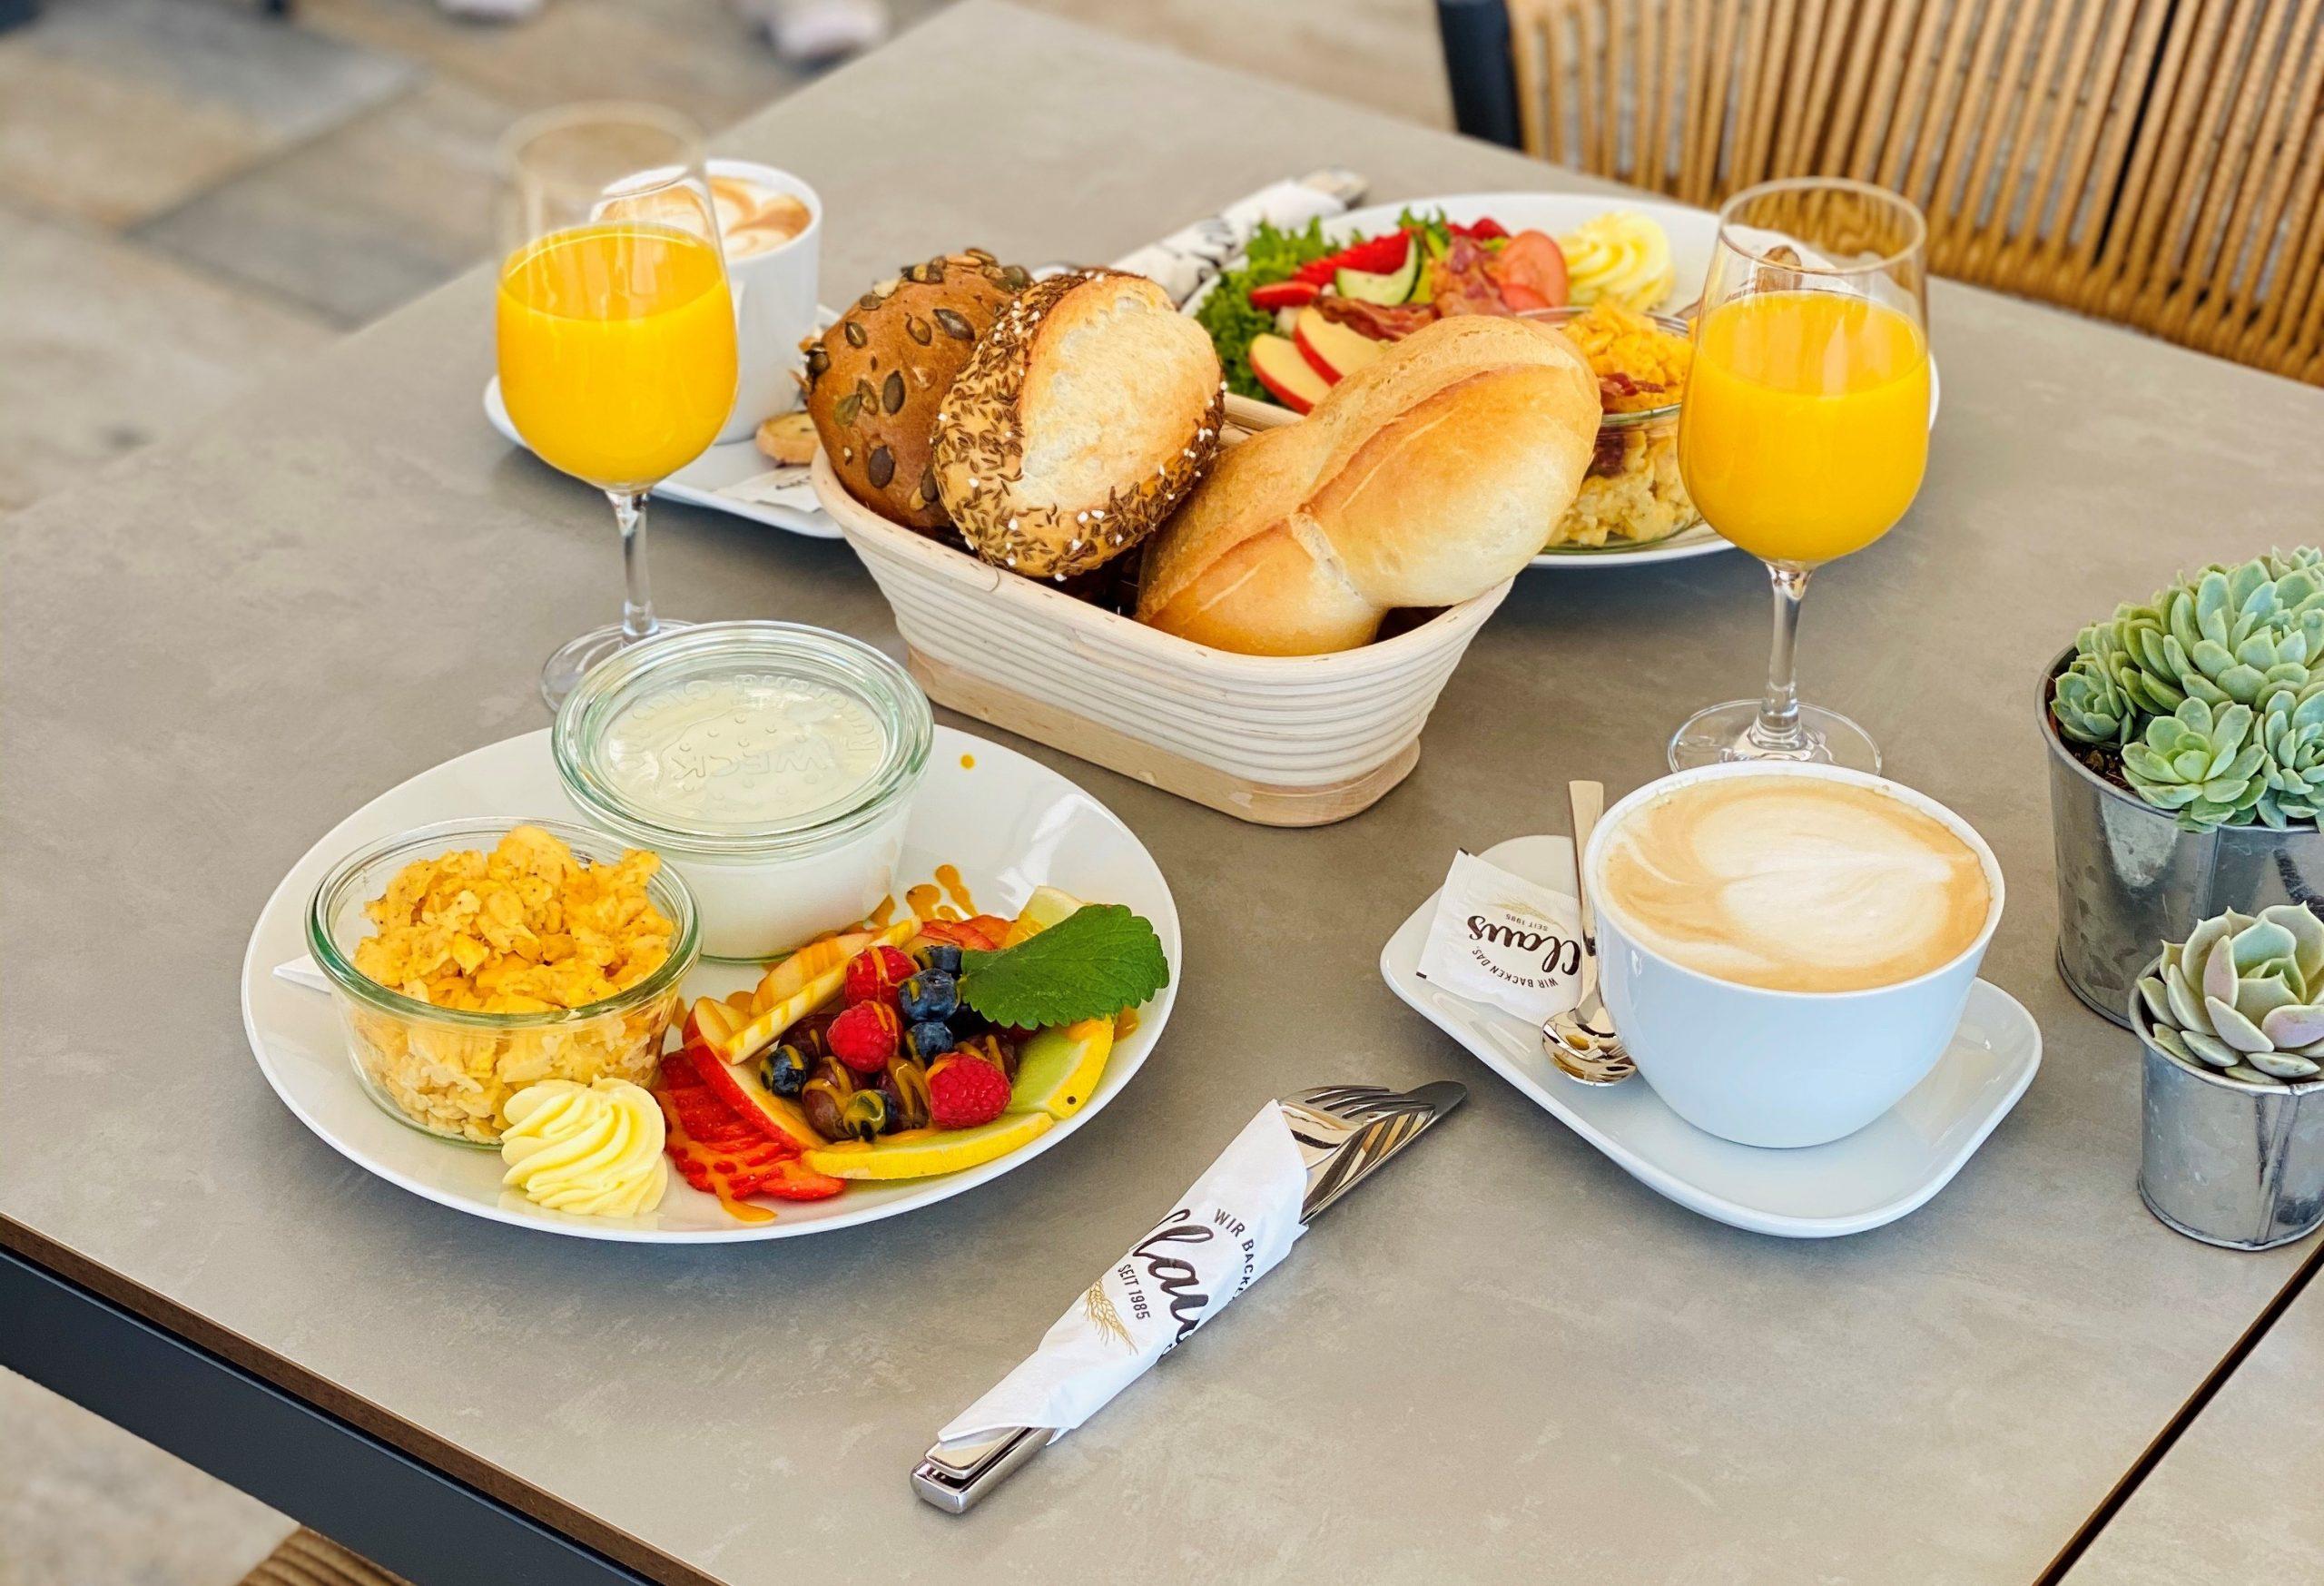 Das Geschäft ändert sich - mittlerweile bietet Bäckerei Claus auch leckeres Frühstück an.